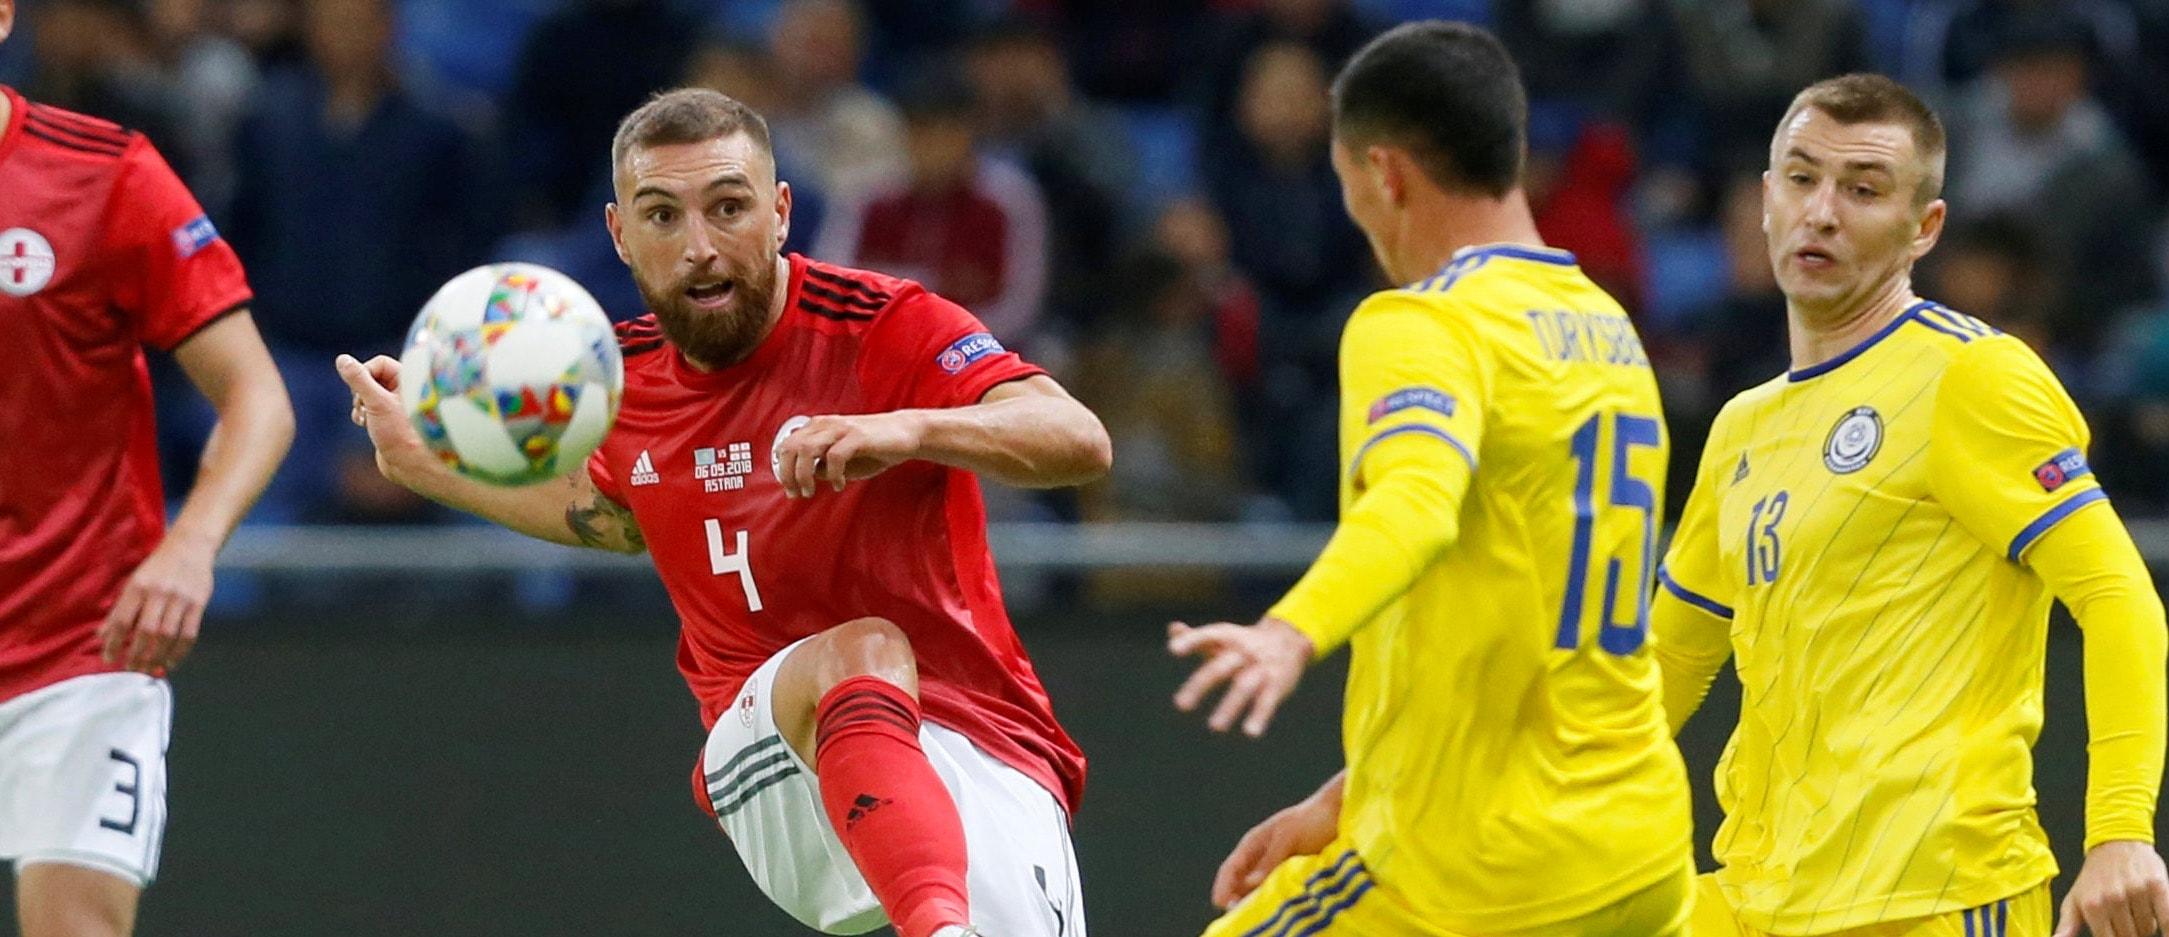 San Jose Earthquakes players impress in UEFA Nations League wins | MLSSoccer.com